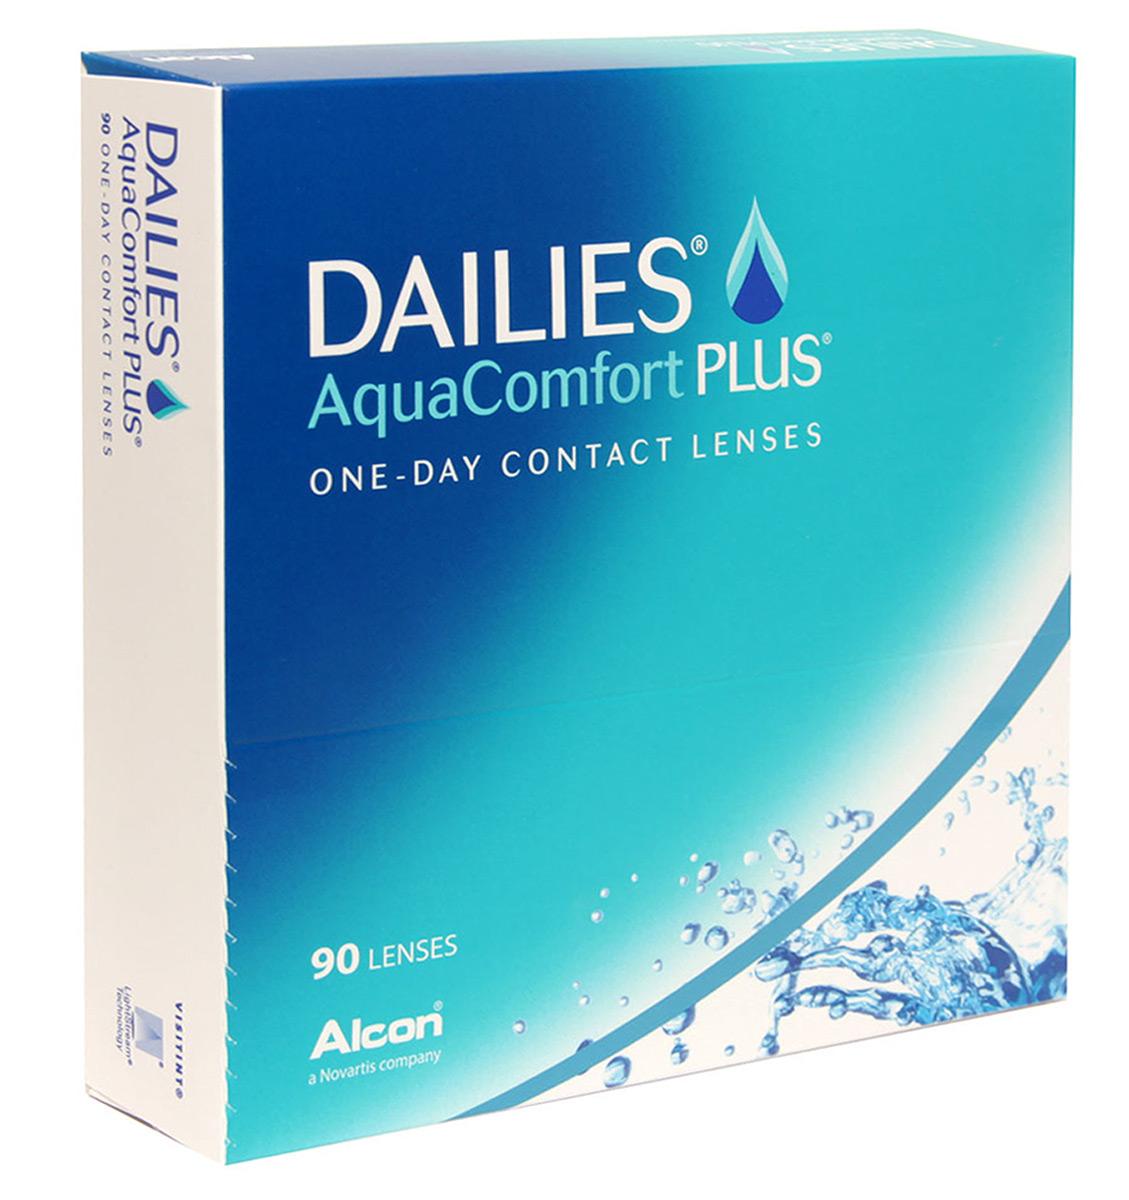 Alcon-CIBA Vision контактные линзы Dailies AquaComfort Plus (90шт / 8.7 / 14.0 / -3.25)